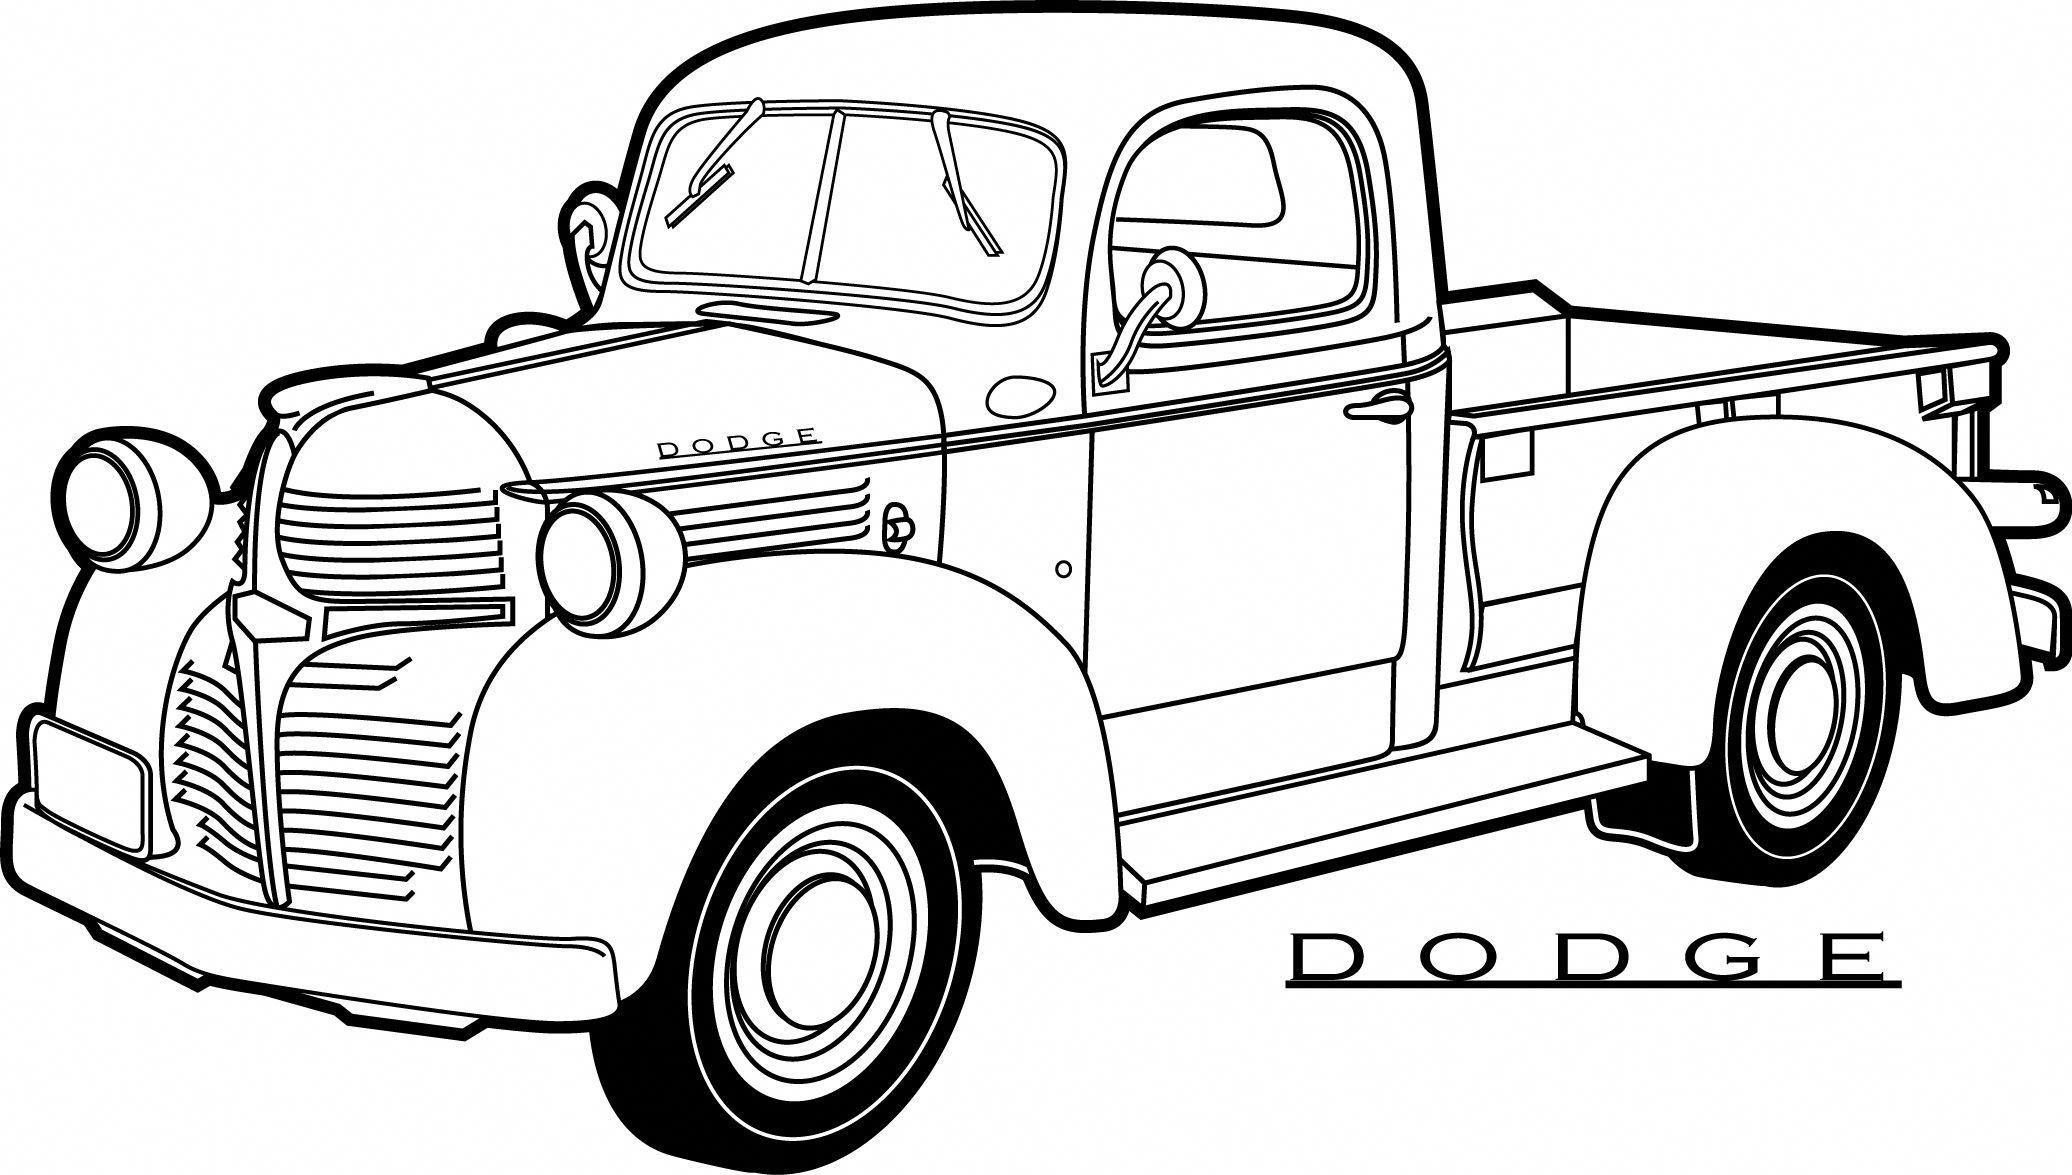 Pickup Truck Storage Pickuptrucks Truck Coloring Pages Cars Coloring Pages Pickup Trucks